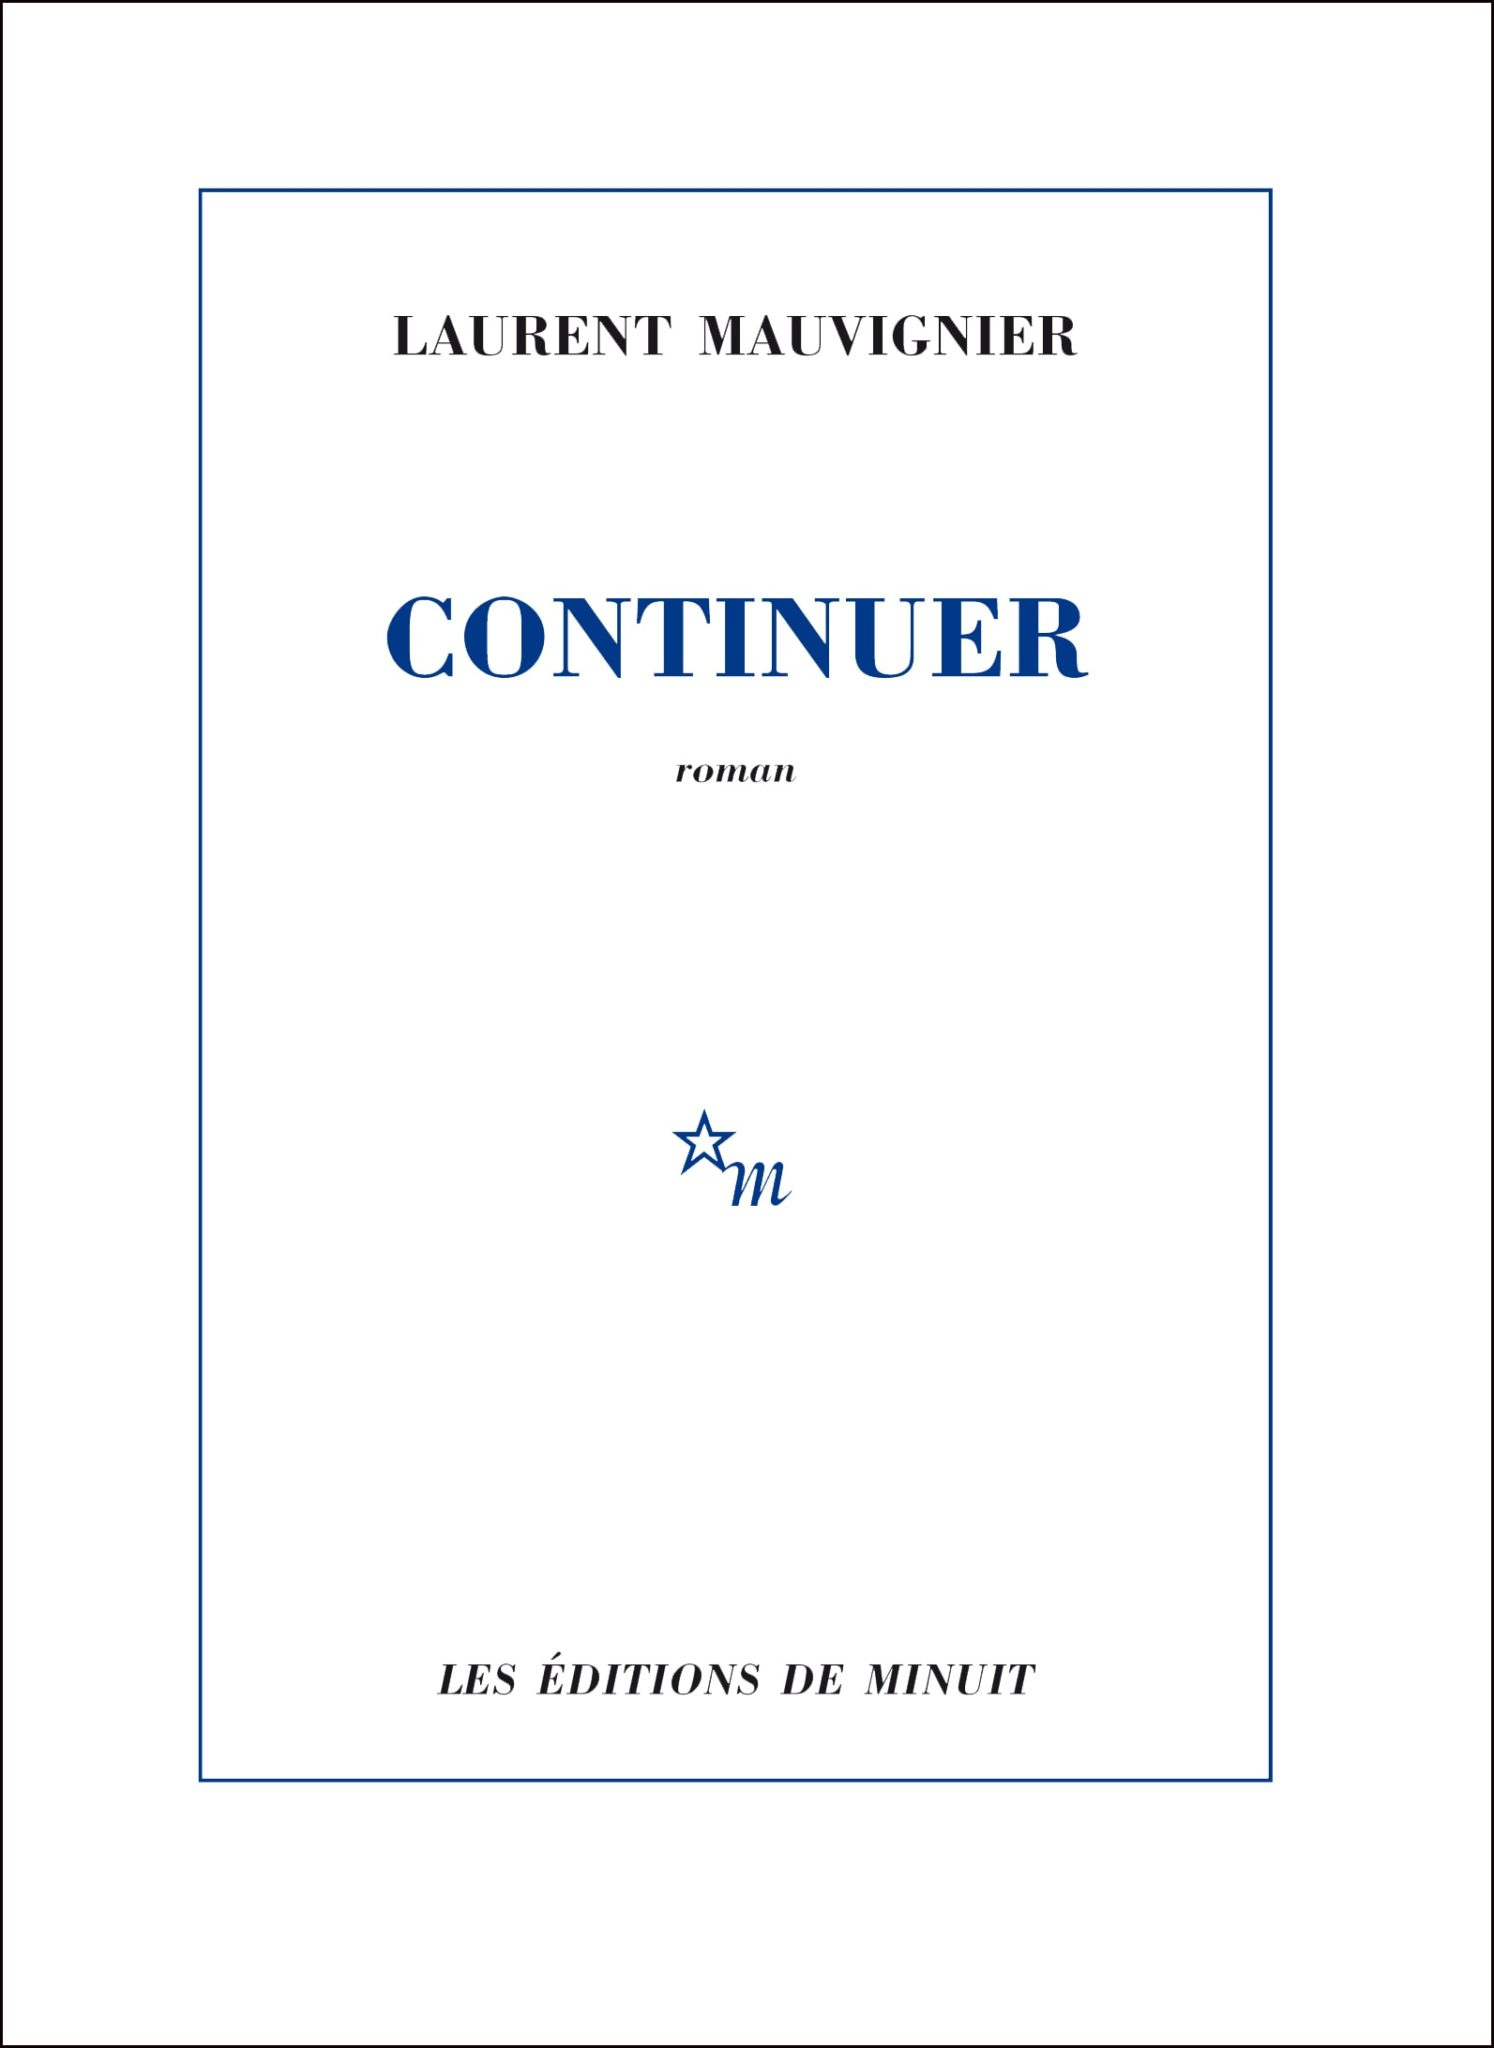 Laurent Mauvignier continuer image couverture